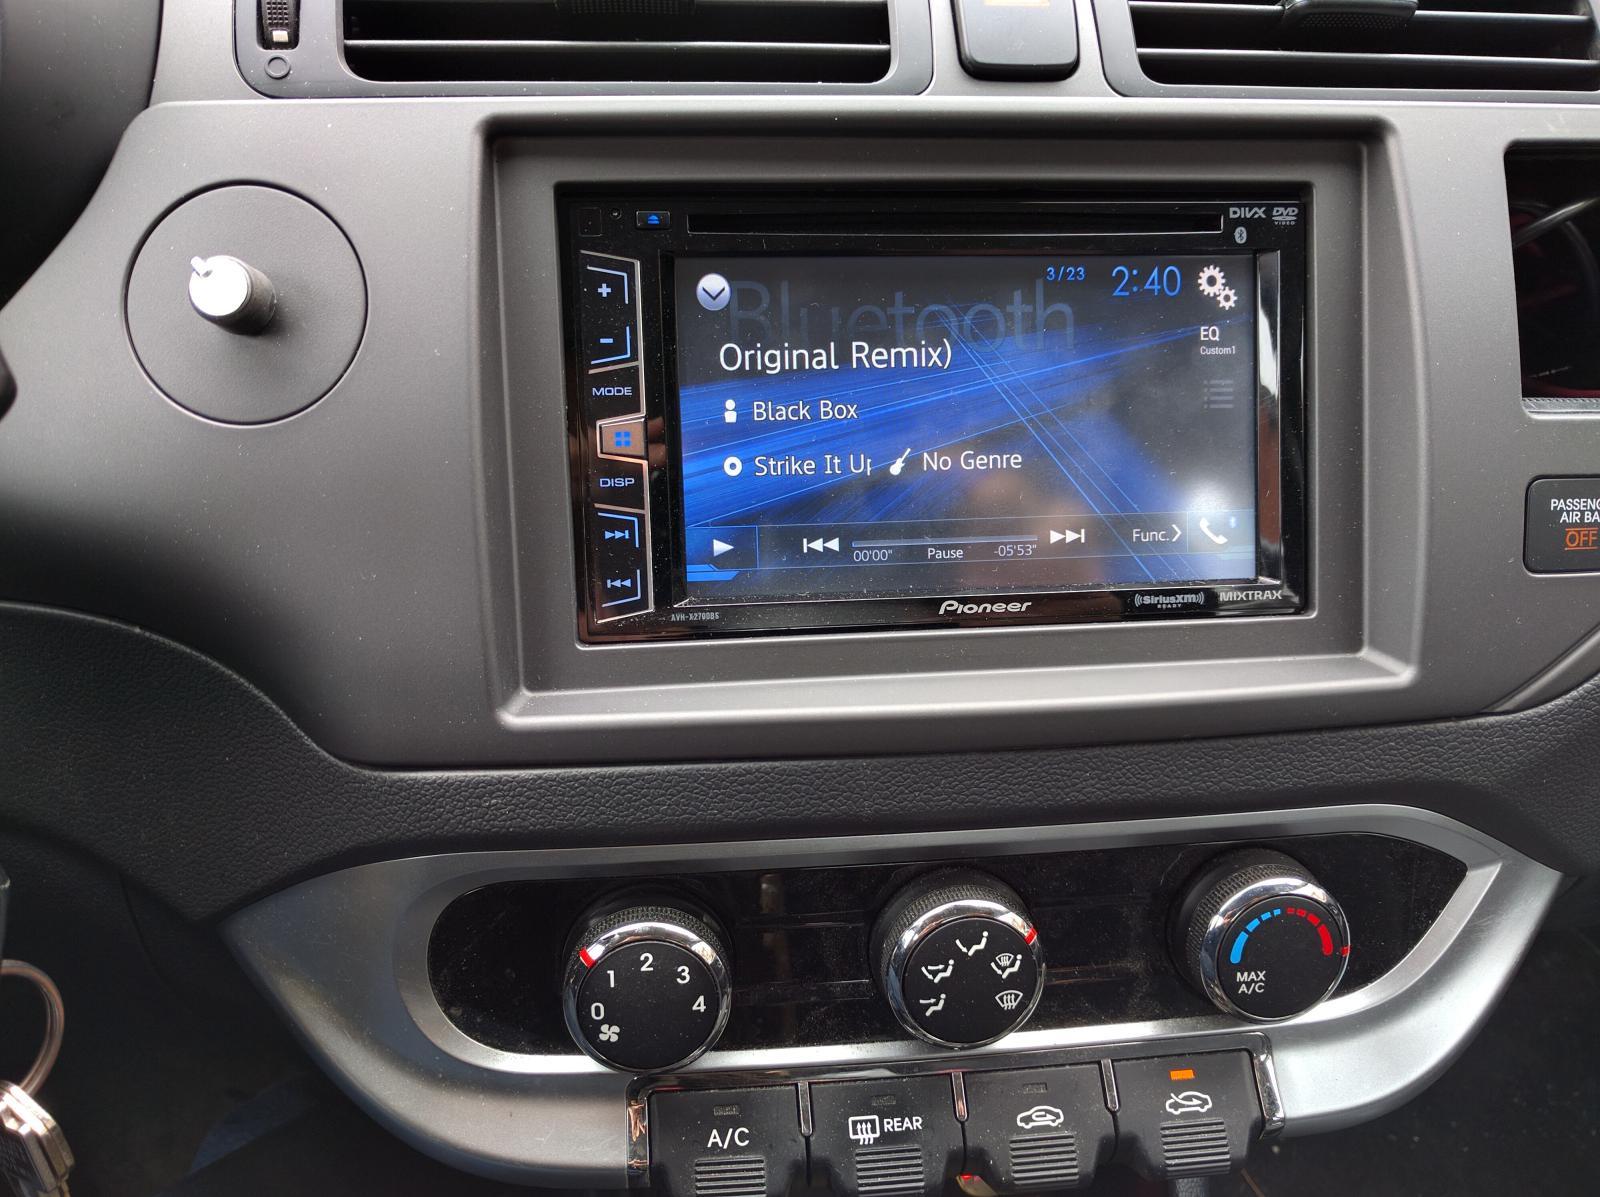 Help W Stereo Install 2013 Rio Sx 5dr Hatch Kia Forum Pioneer Car Wiring Adapters Img 20160323 144039